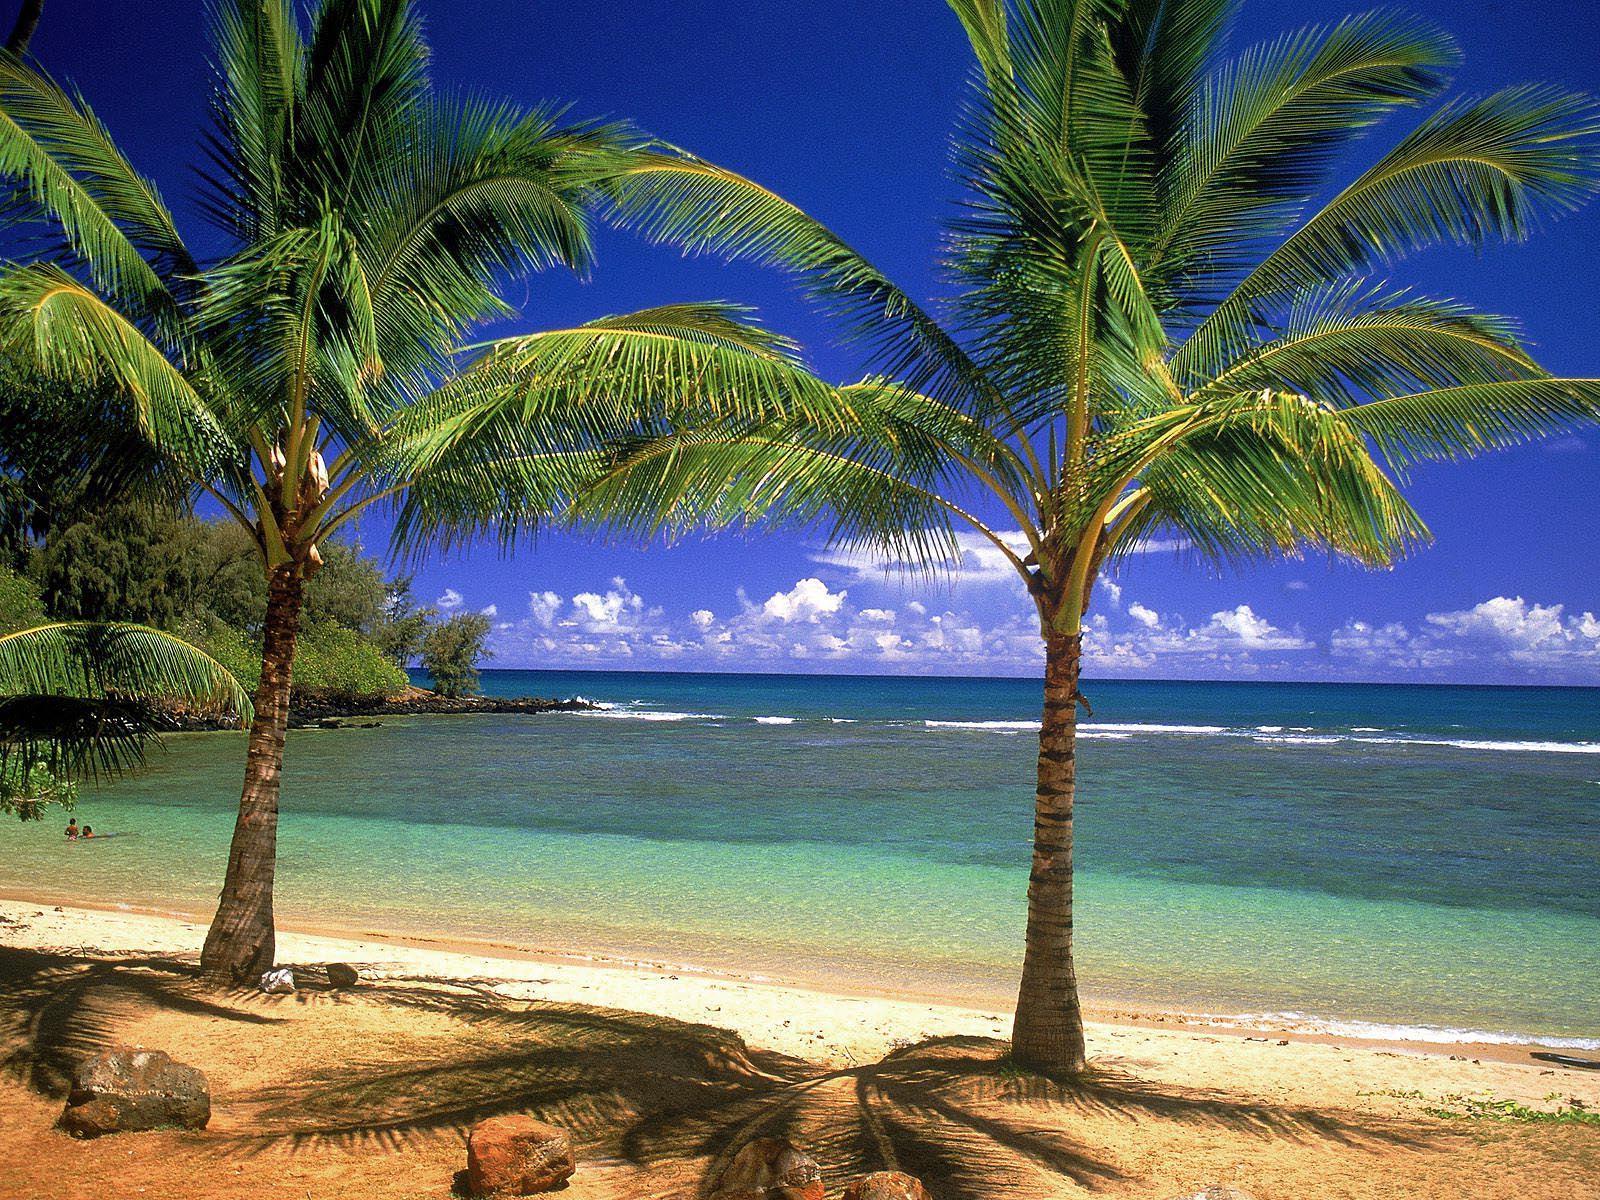 palm trees desktop wallpaper   weddingdressincom 1600x1200